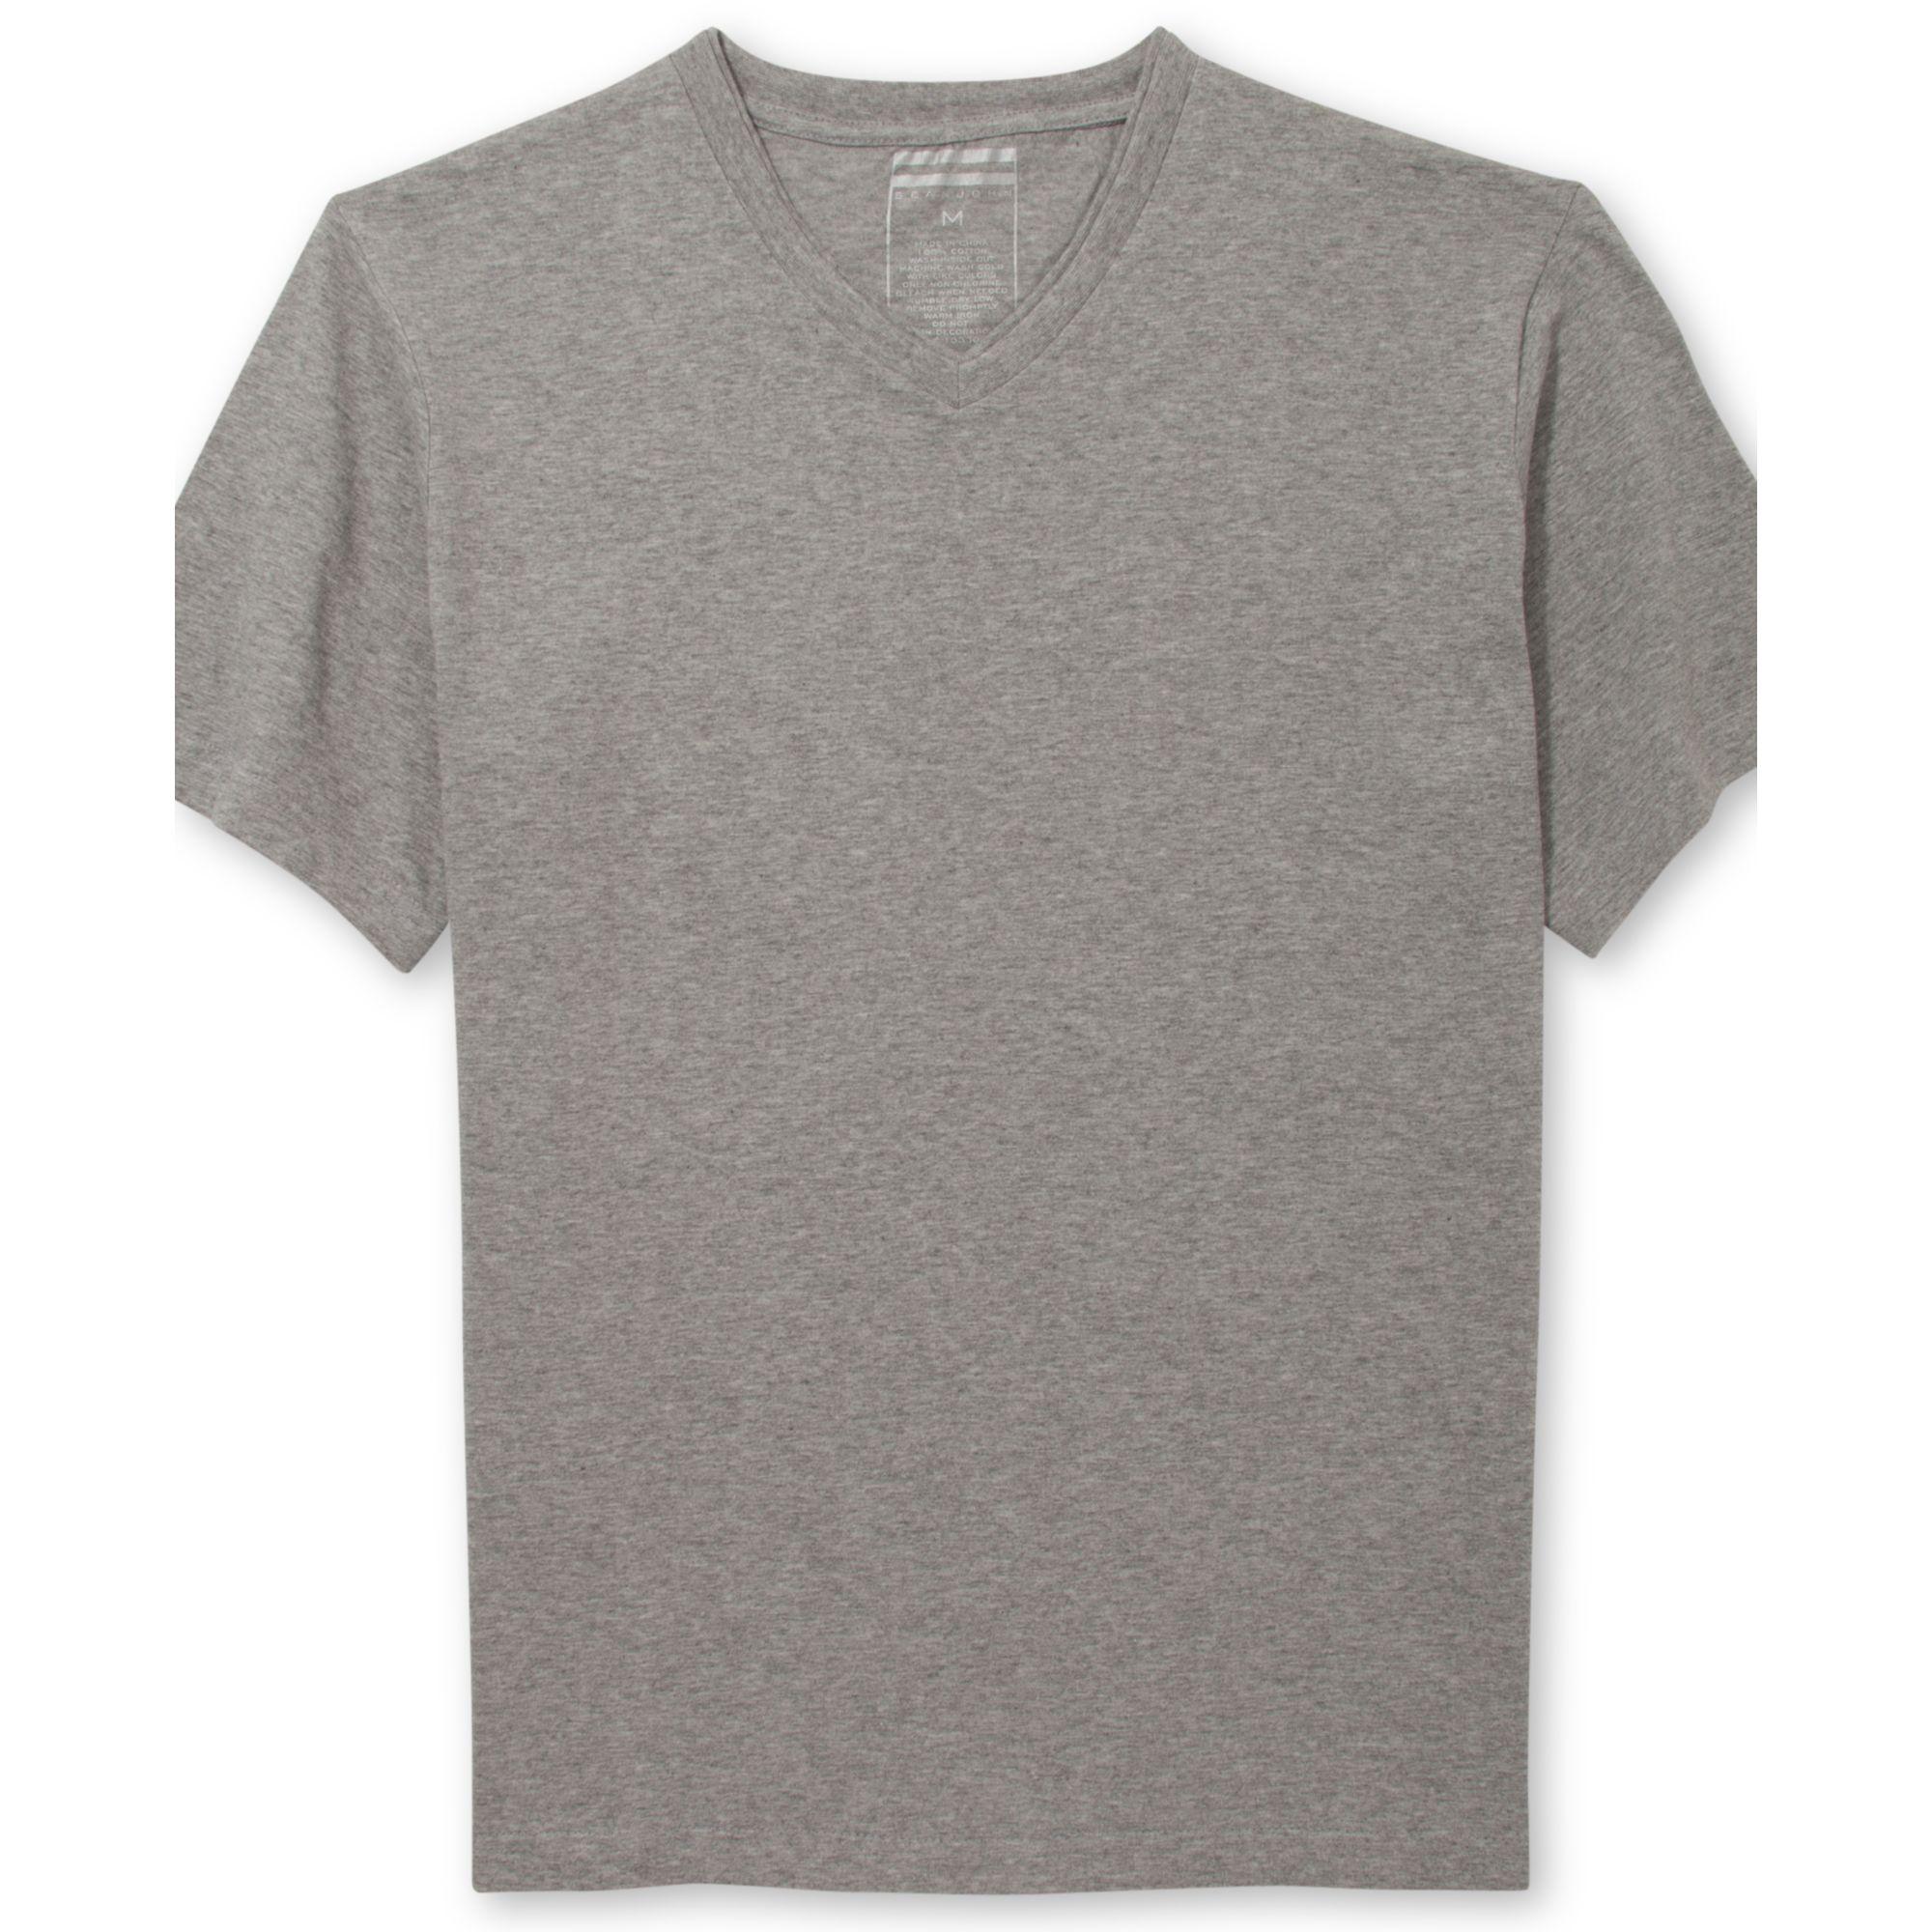 sean john solid v neck t shirt in gray for men grey mix